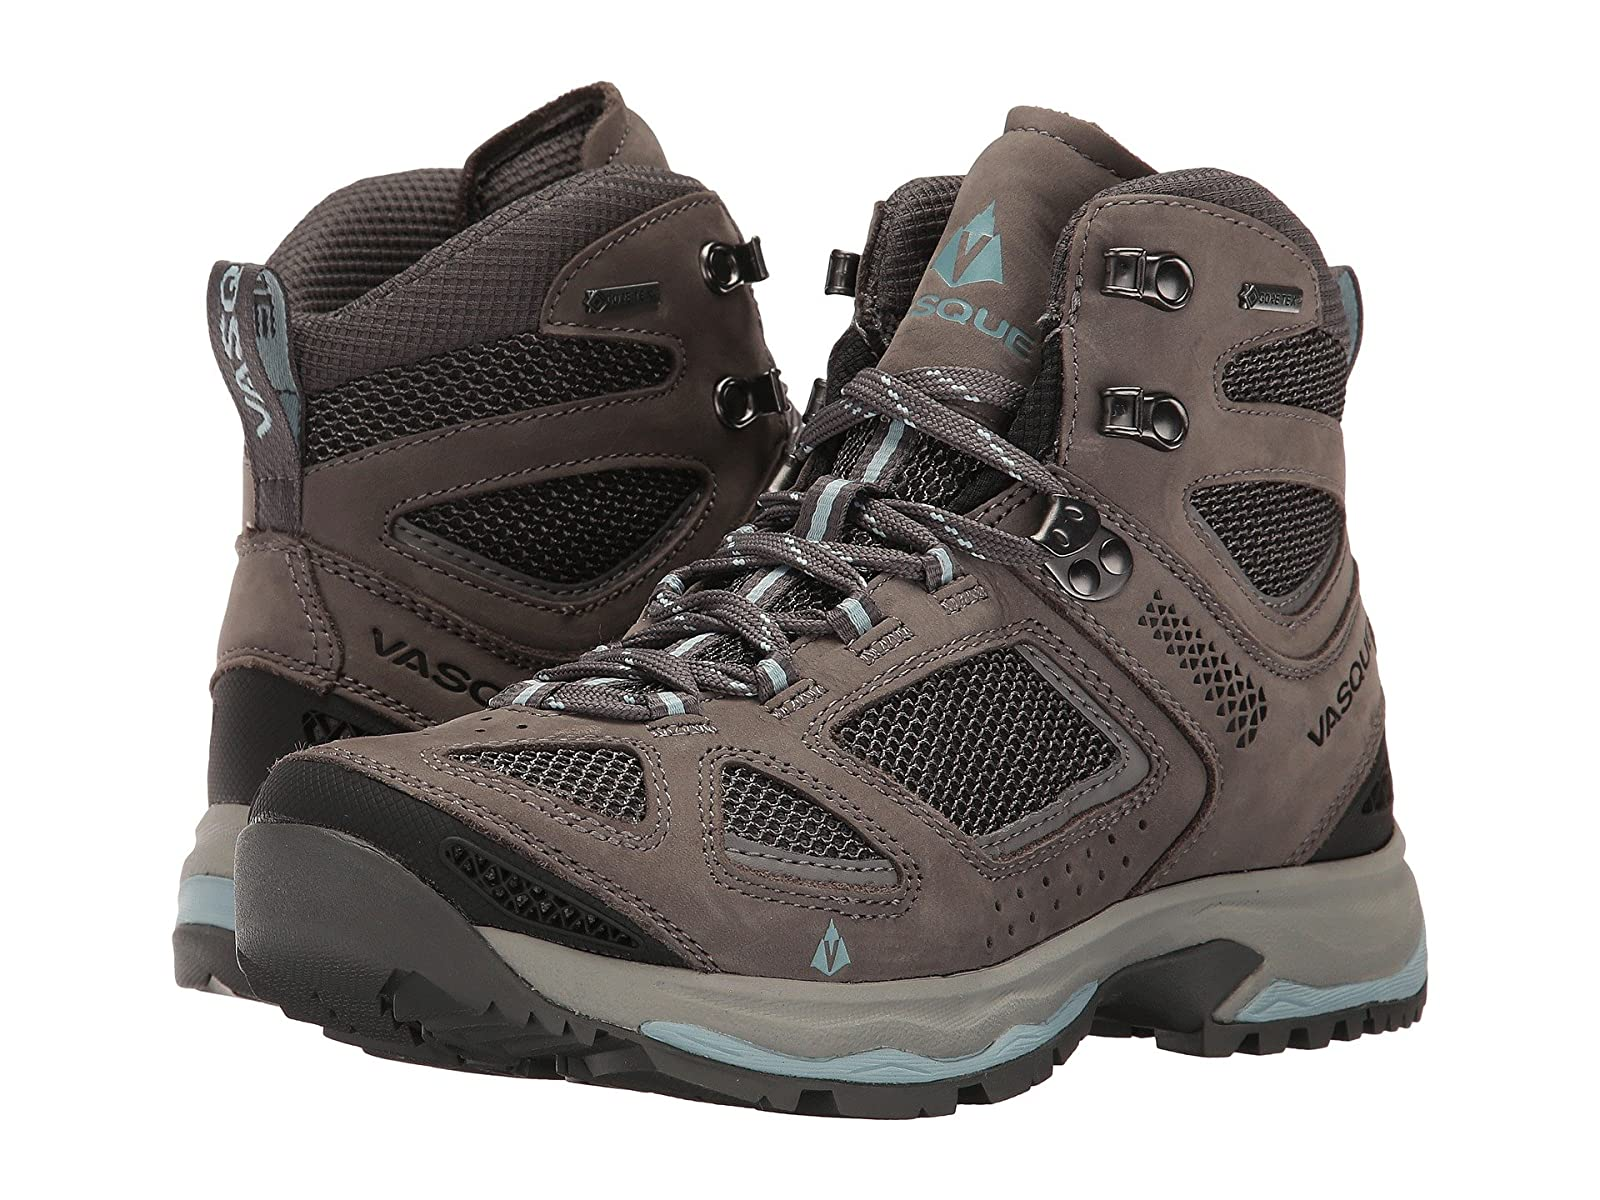 Vasque Breeze III GTXEconomical and quality shoes